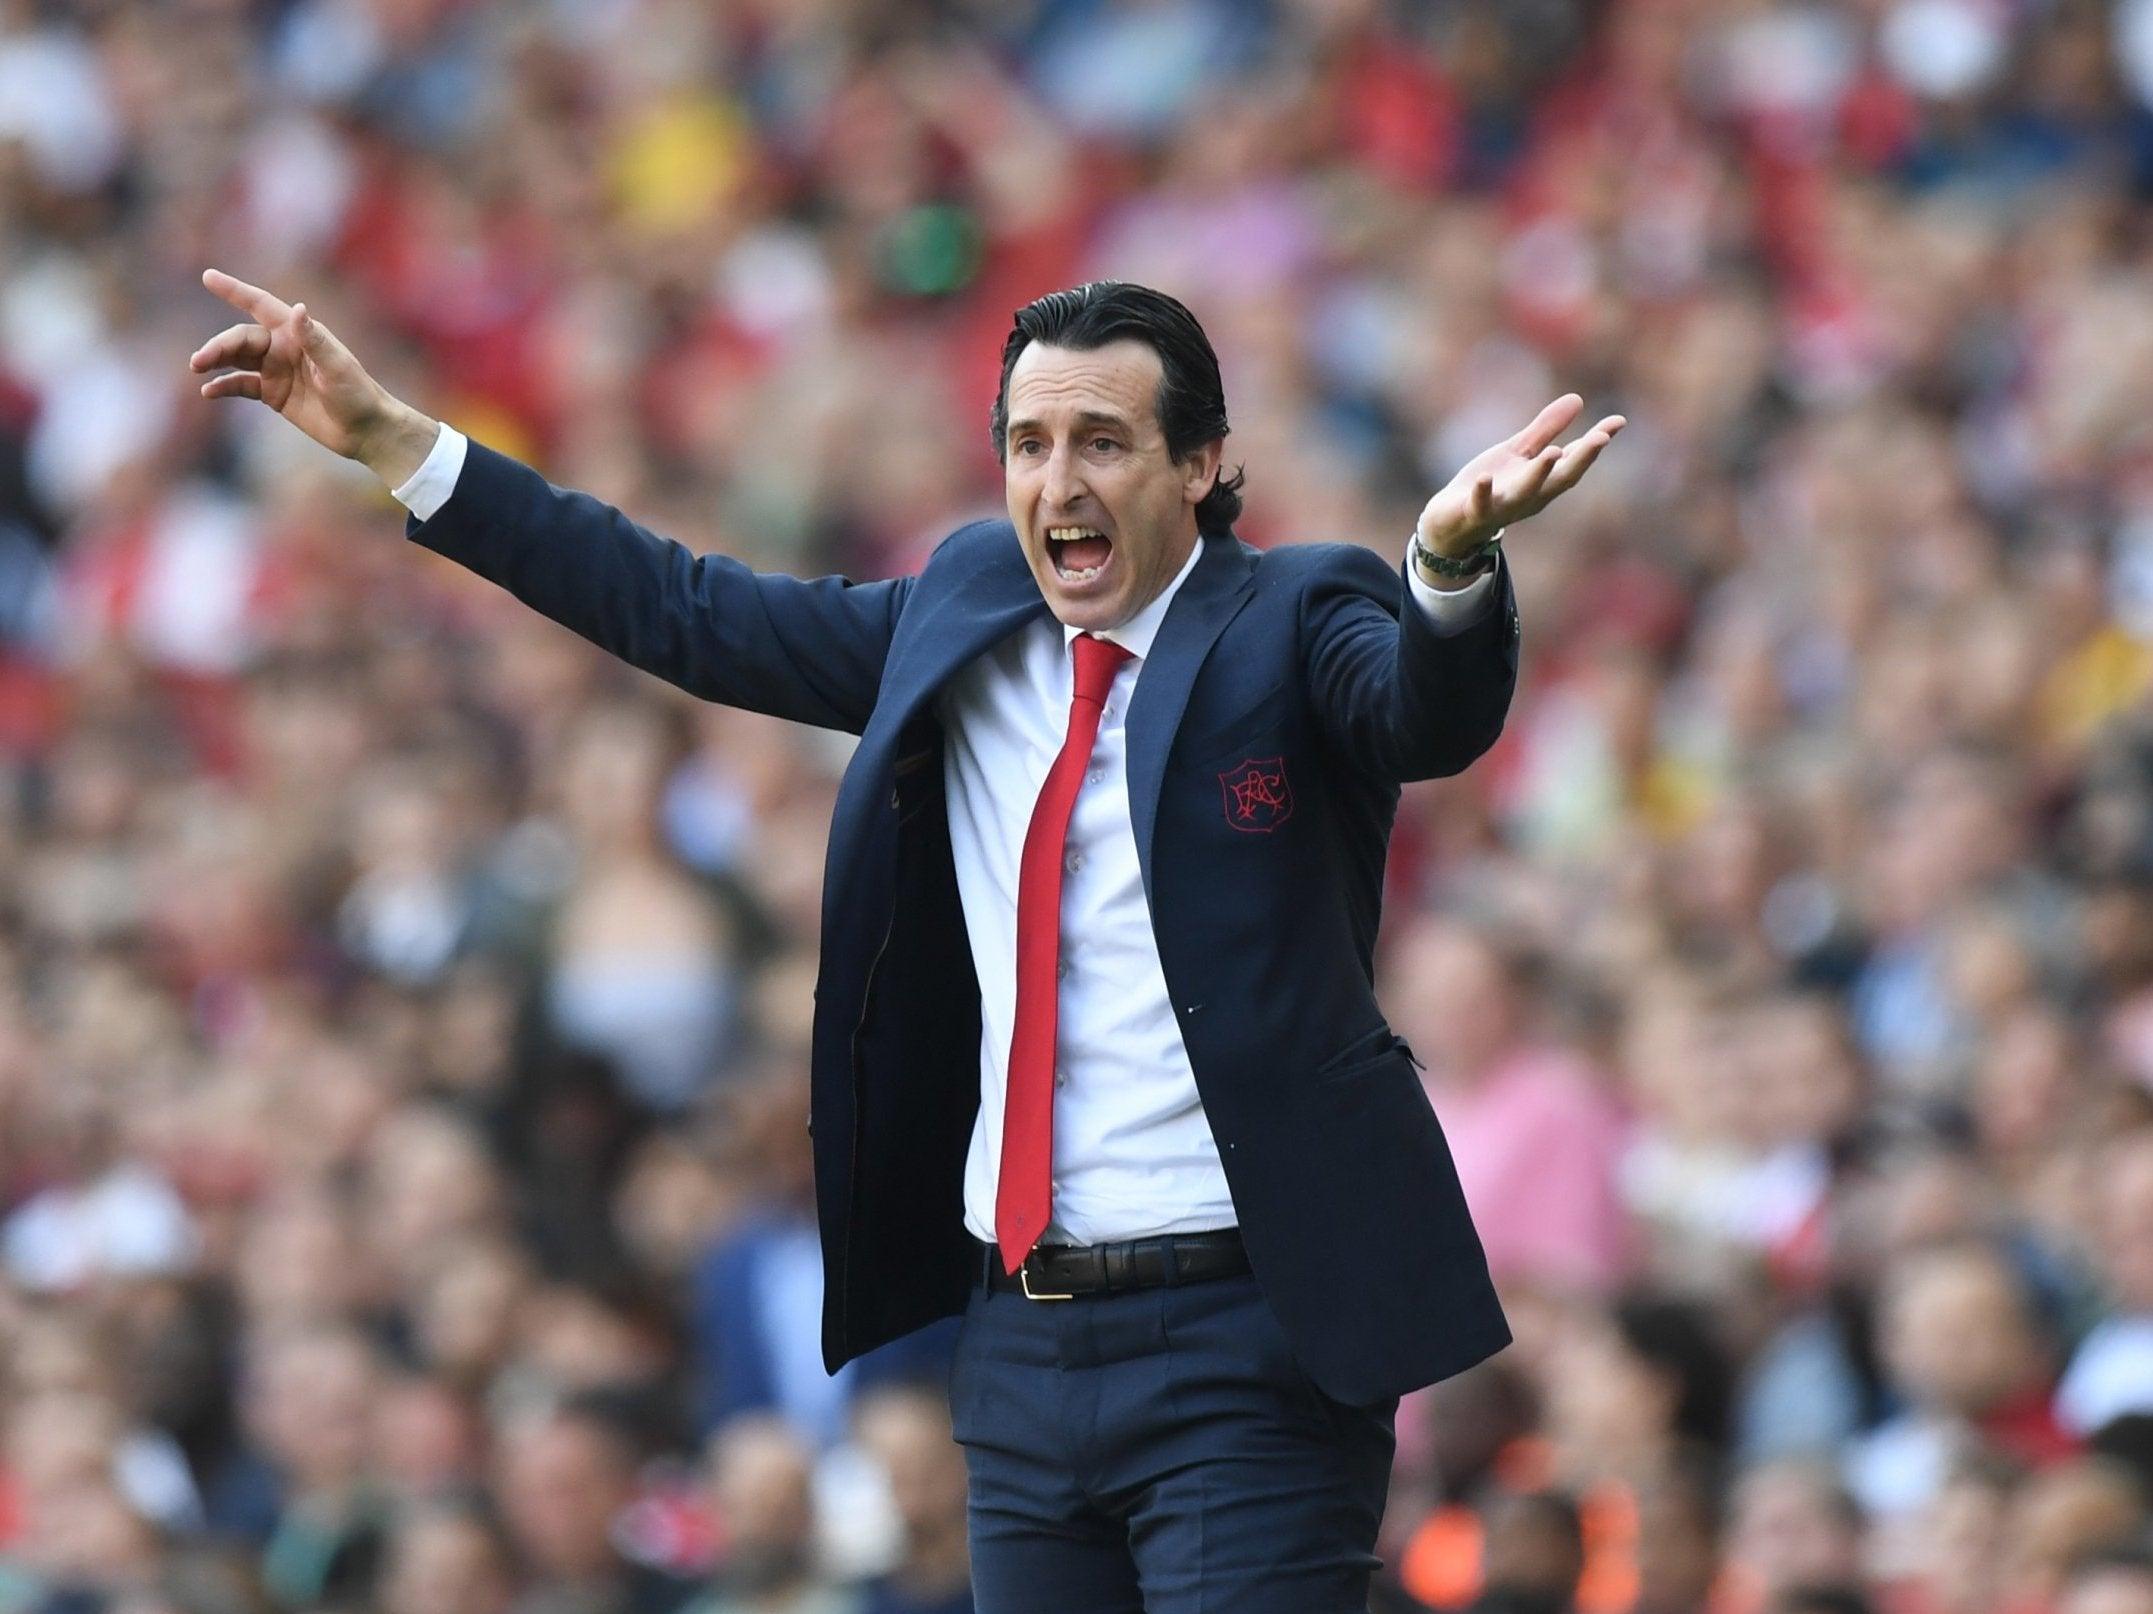 Arsenal news: Unai Emery to keep rotating squad despite Palace defeat